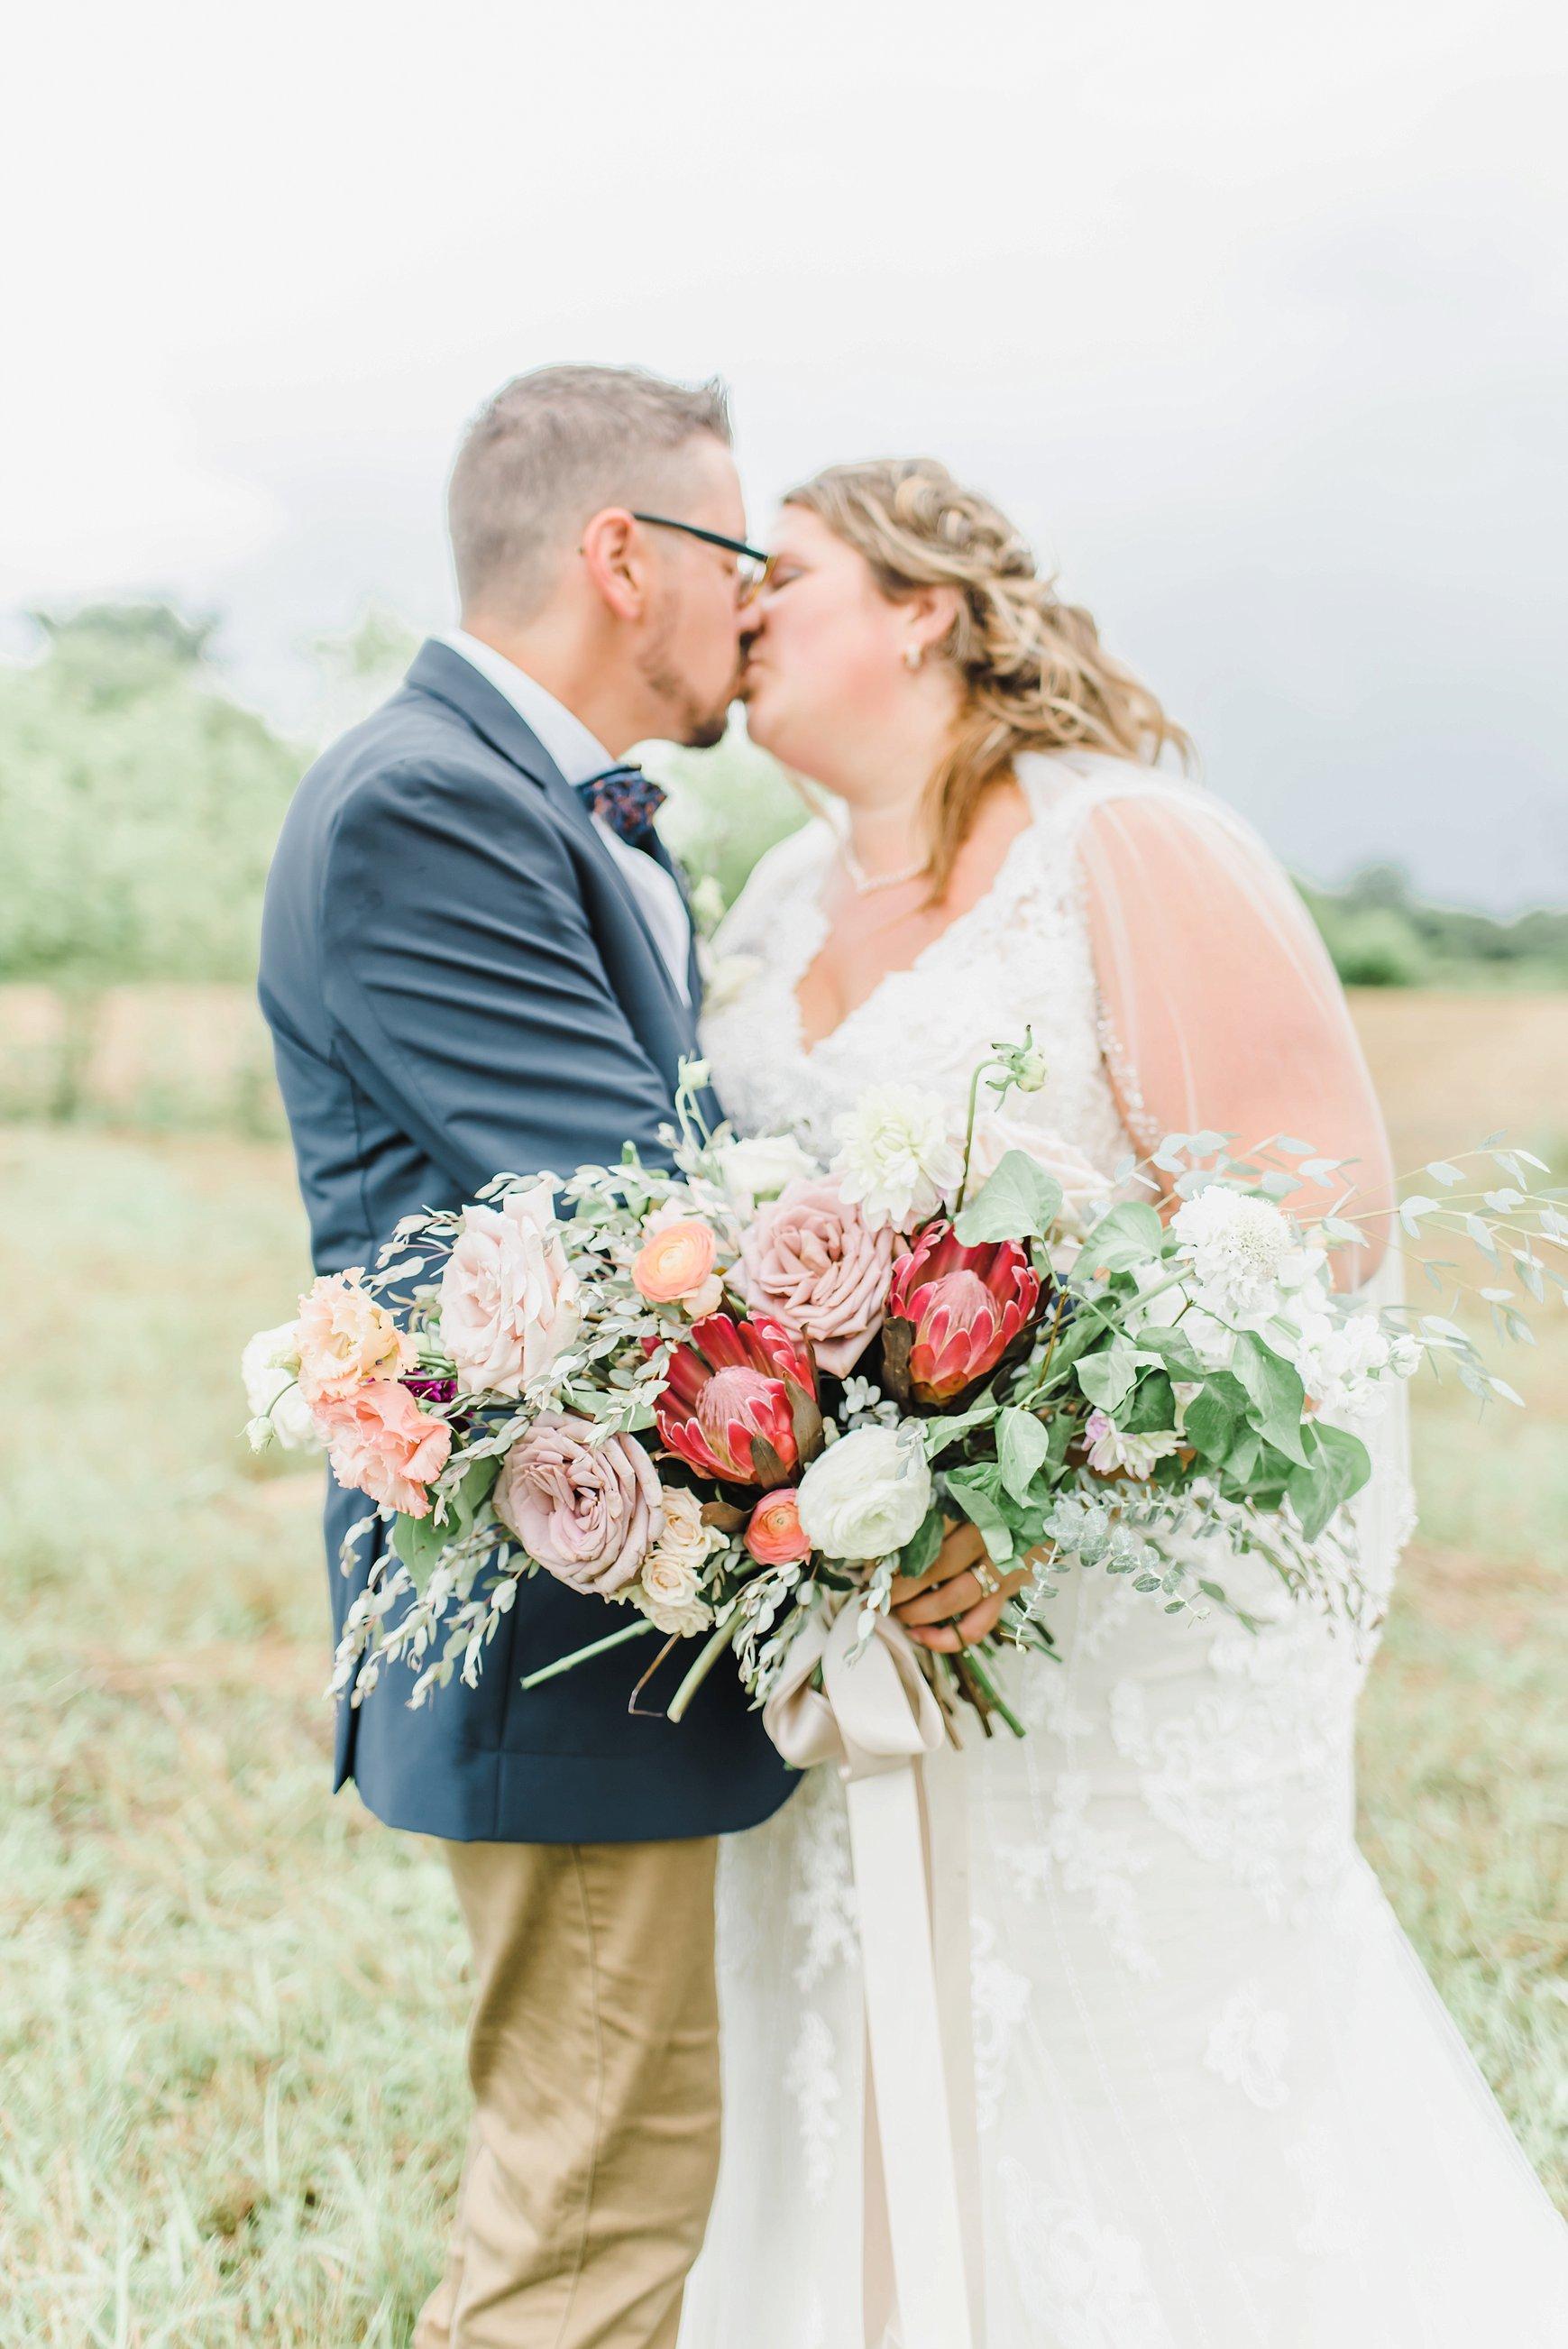 light airy indie fine art ottawa wedding photographer | Ali and Batoul Photography_0411.jpg